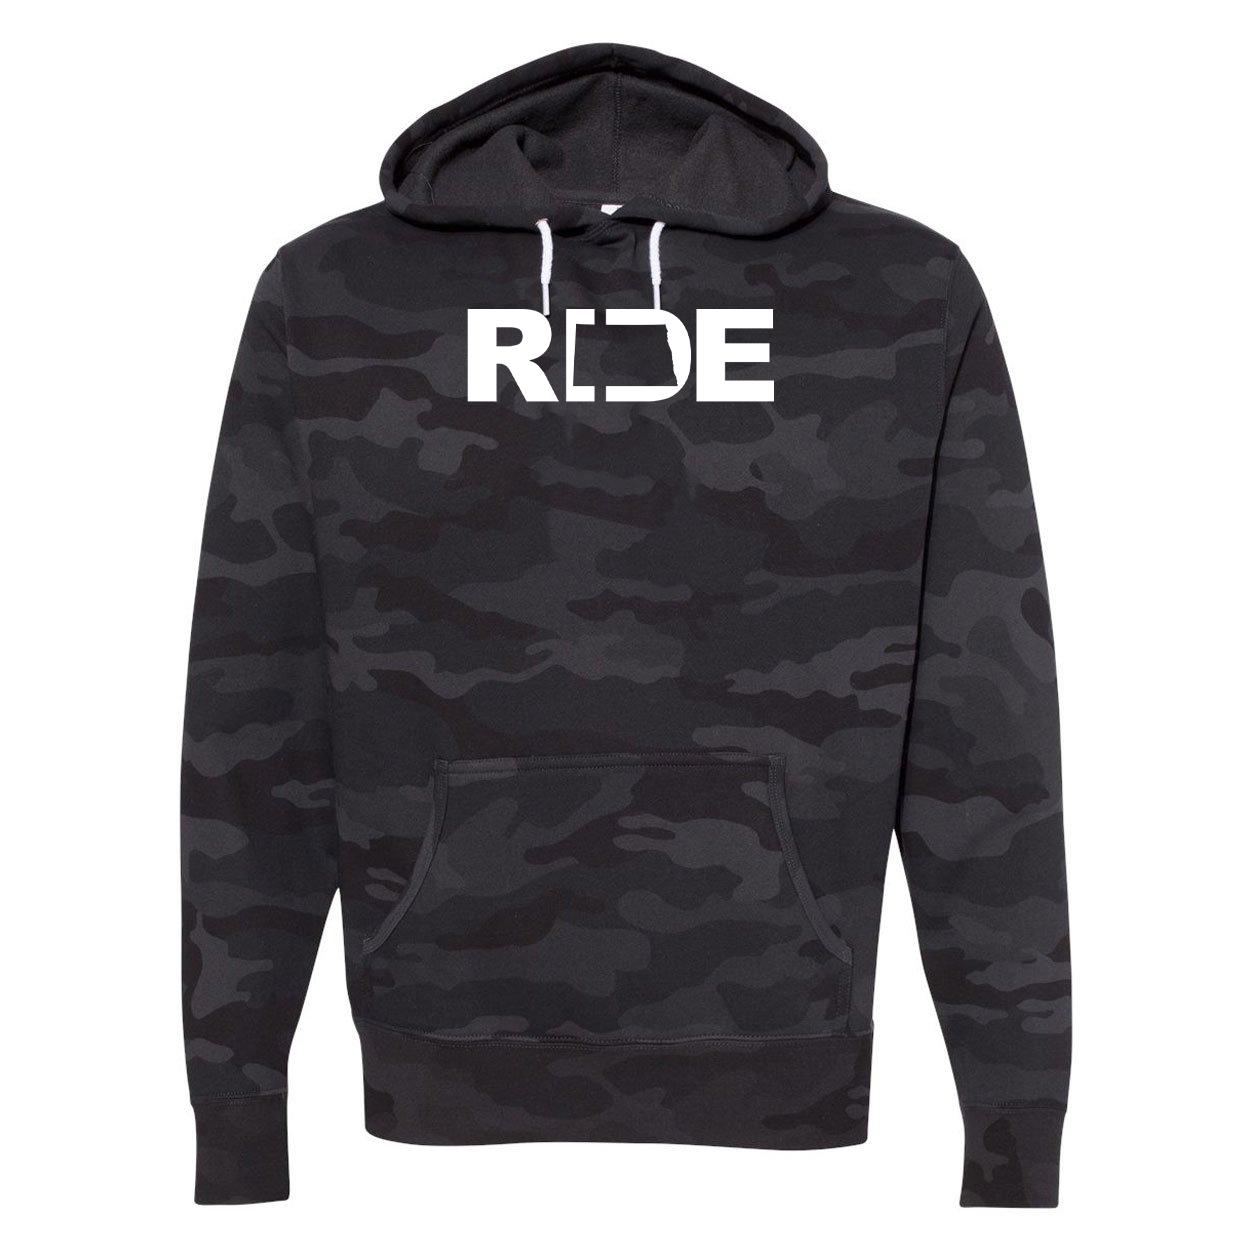 Ride North Dakota Classic Unisex Hooded Sweatshirt Black Camo (White Logo)